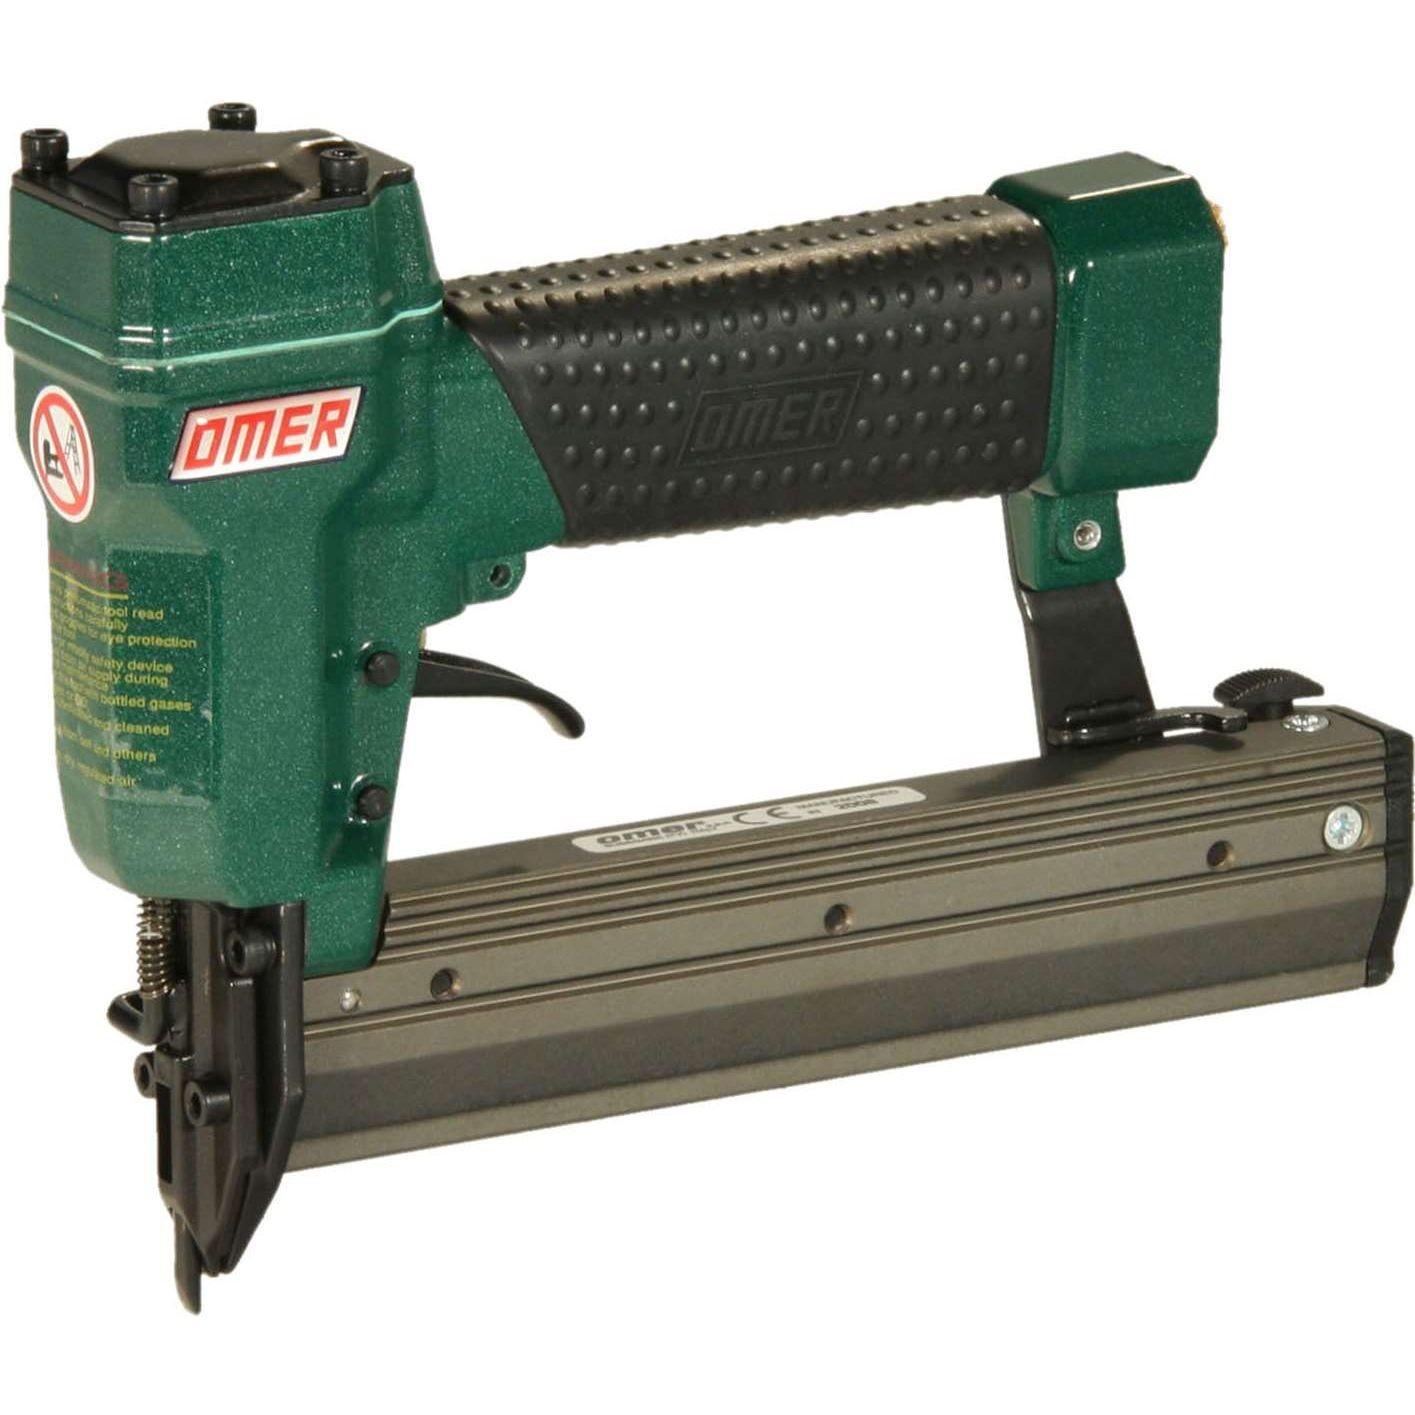 Omer 21 Gauge Micro Brad Nailer 10-30mm